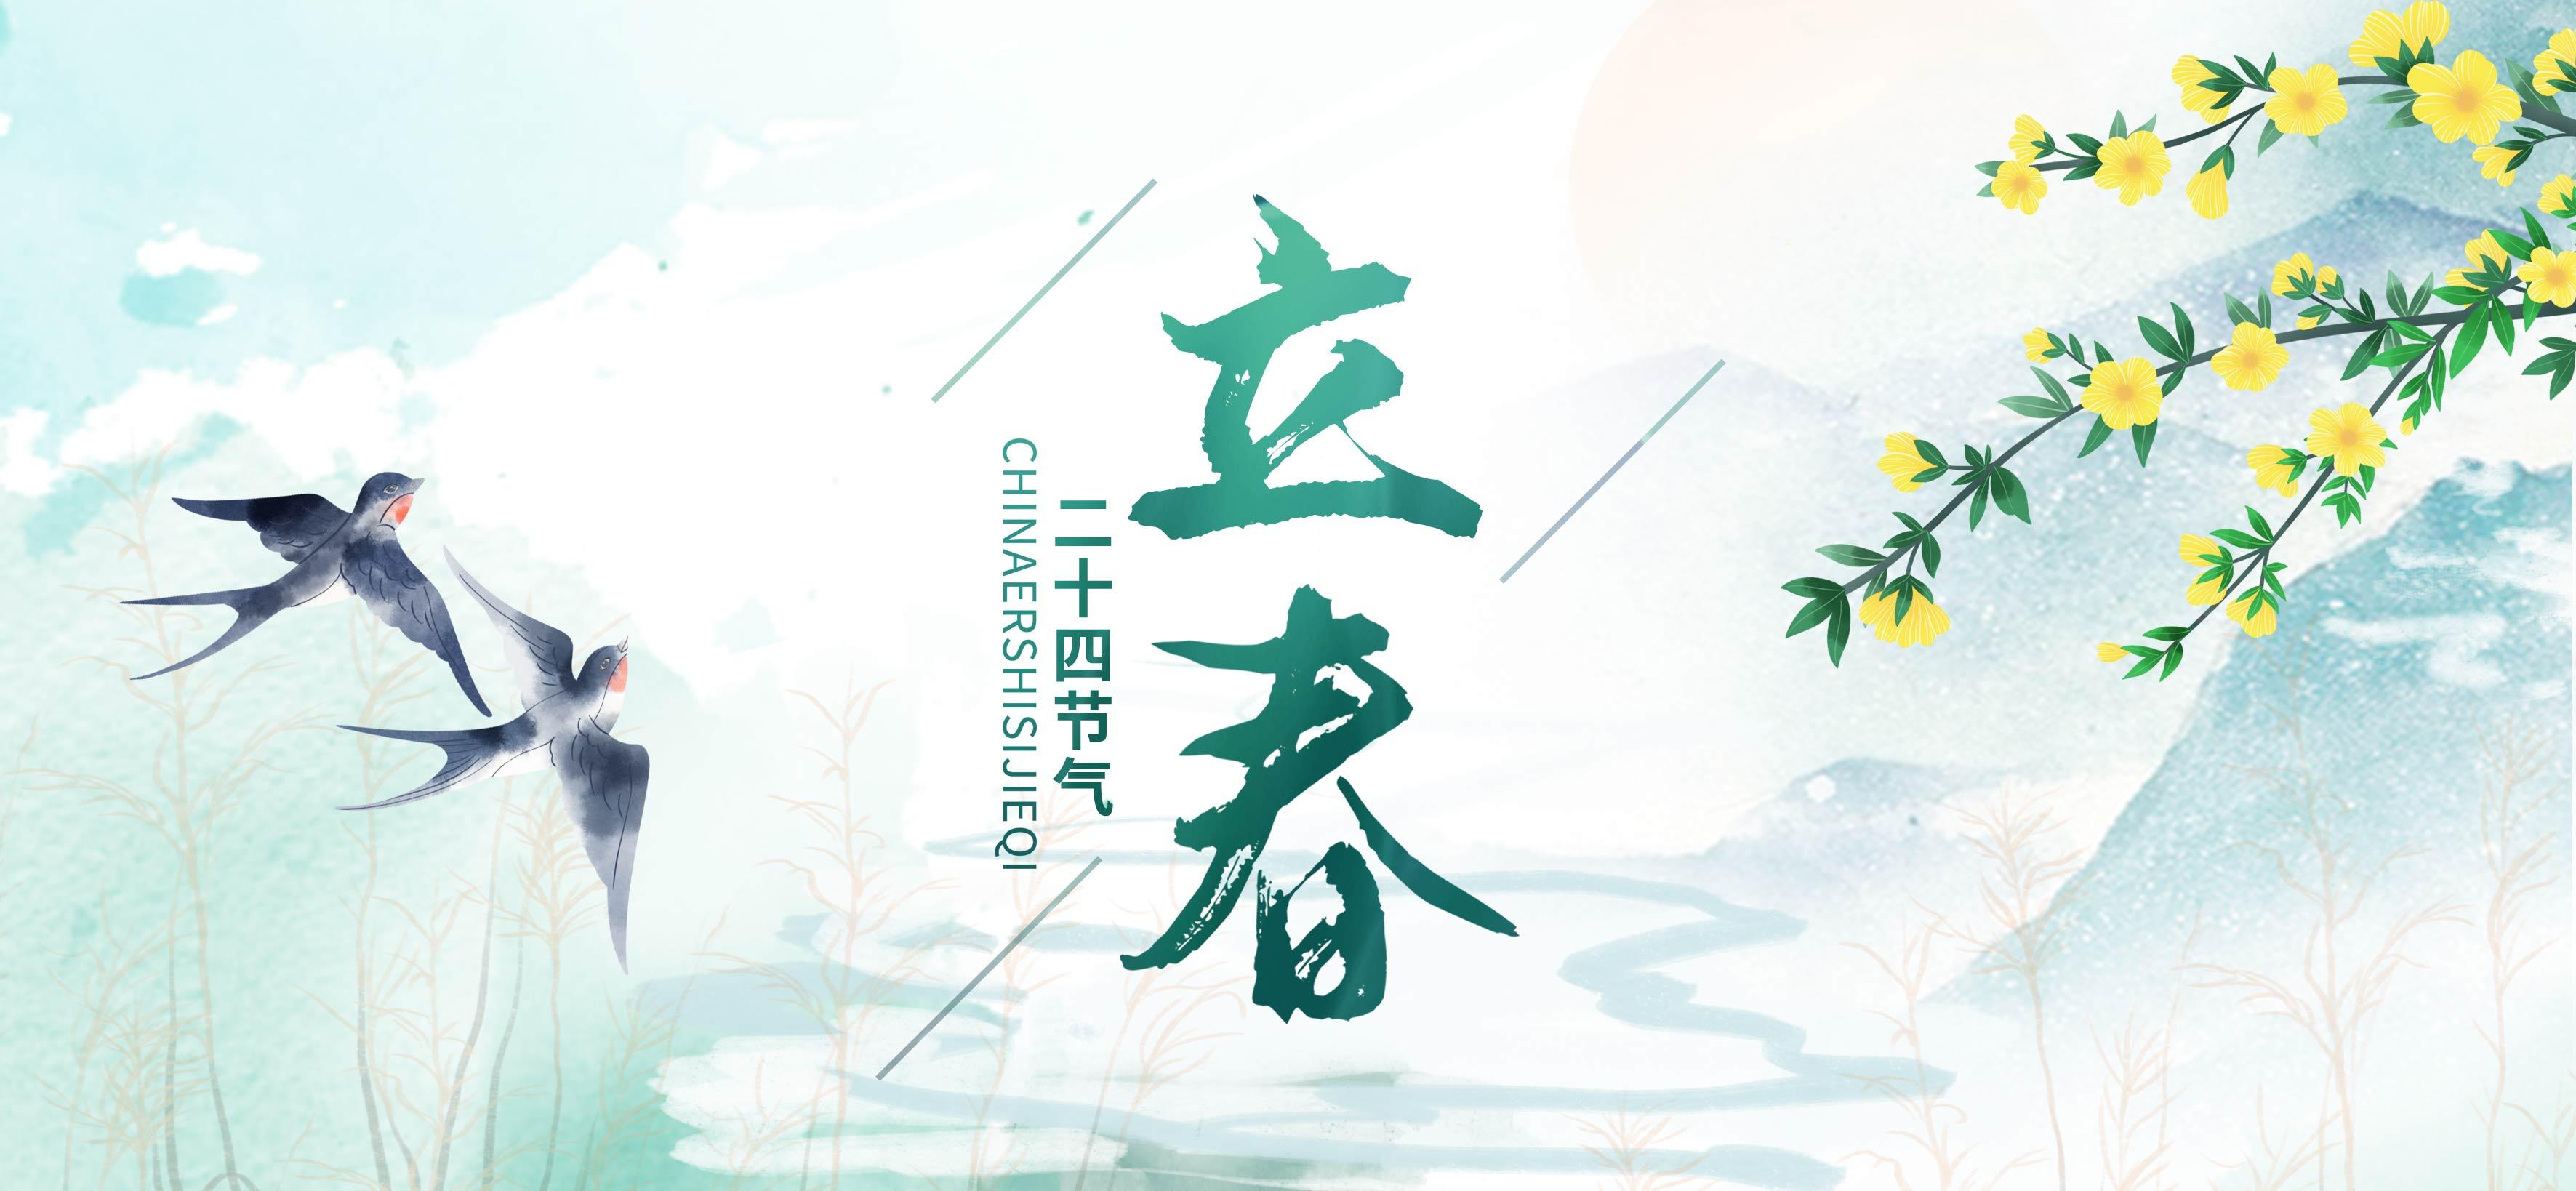 https://timcloud.oss-cn-shanghai.aliyuncs.com/file/iot4/picture/2021/2/3/1612331337493.jpg